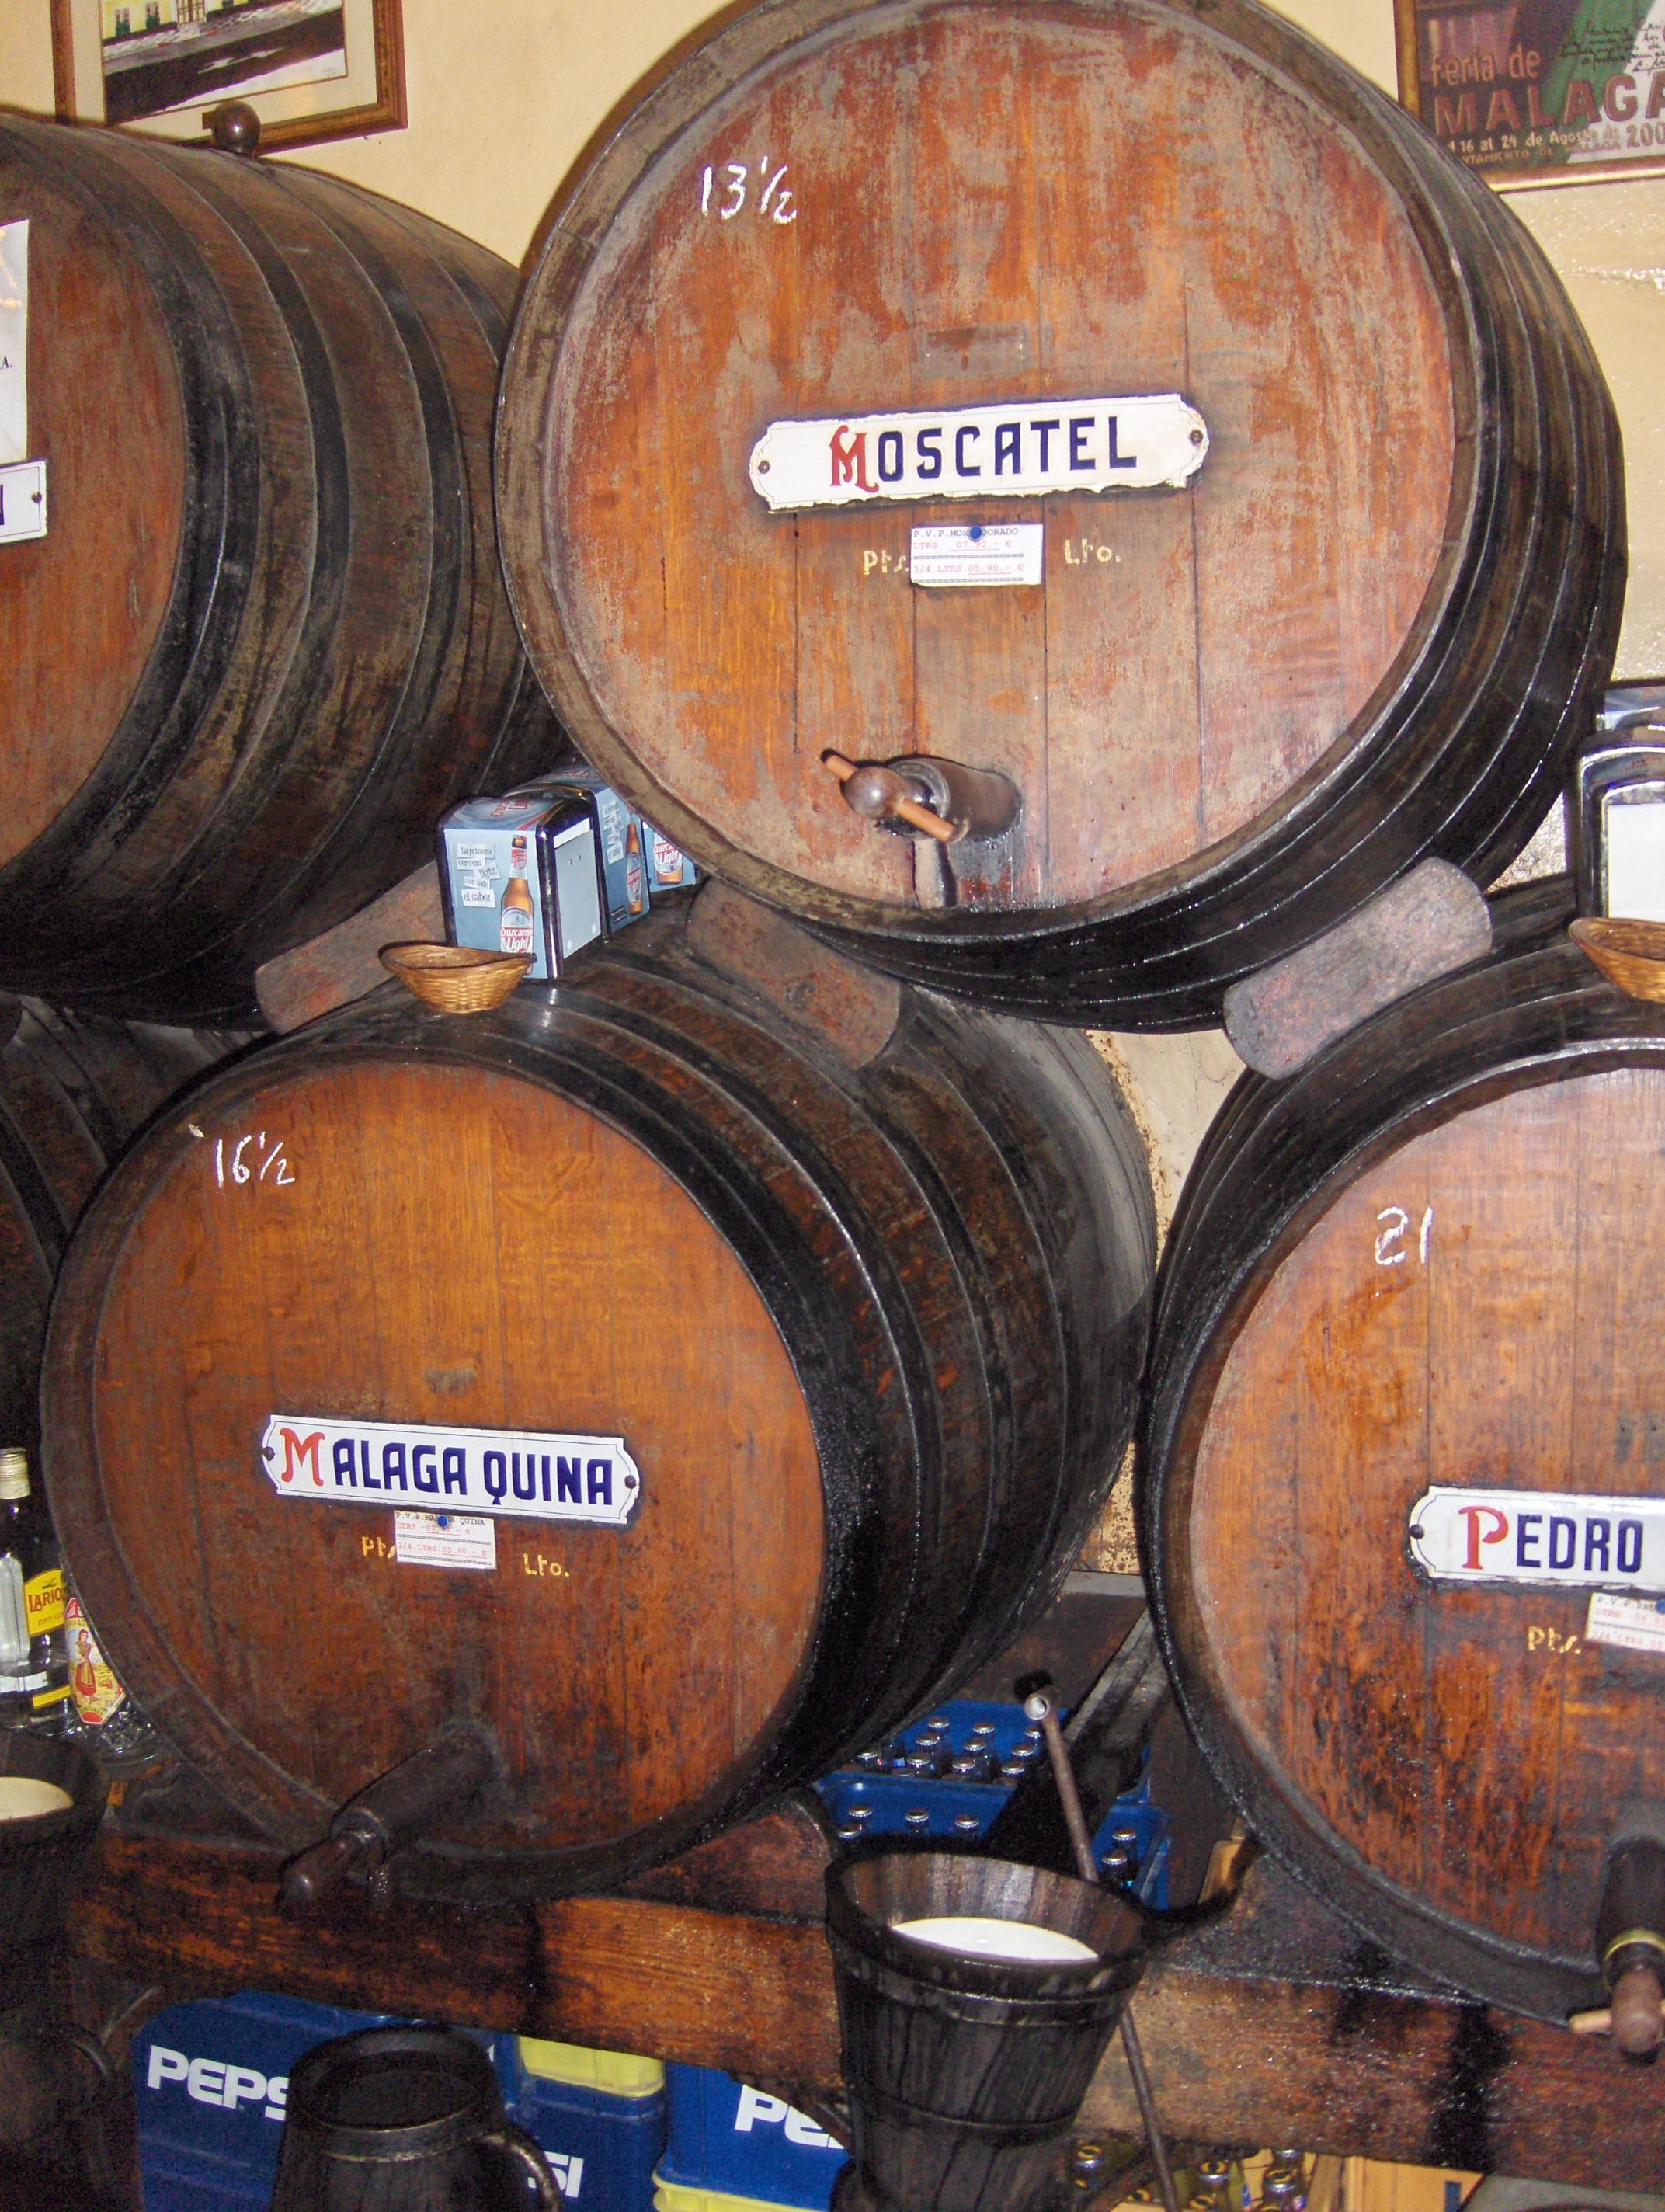 Бочки с вином, Андалусия, Малага